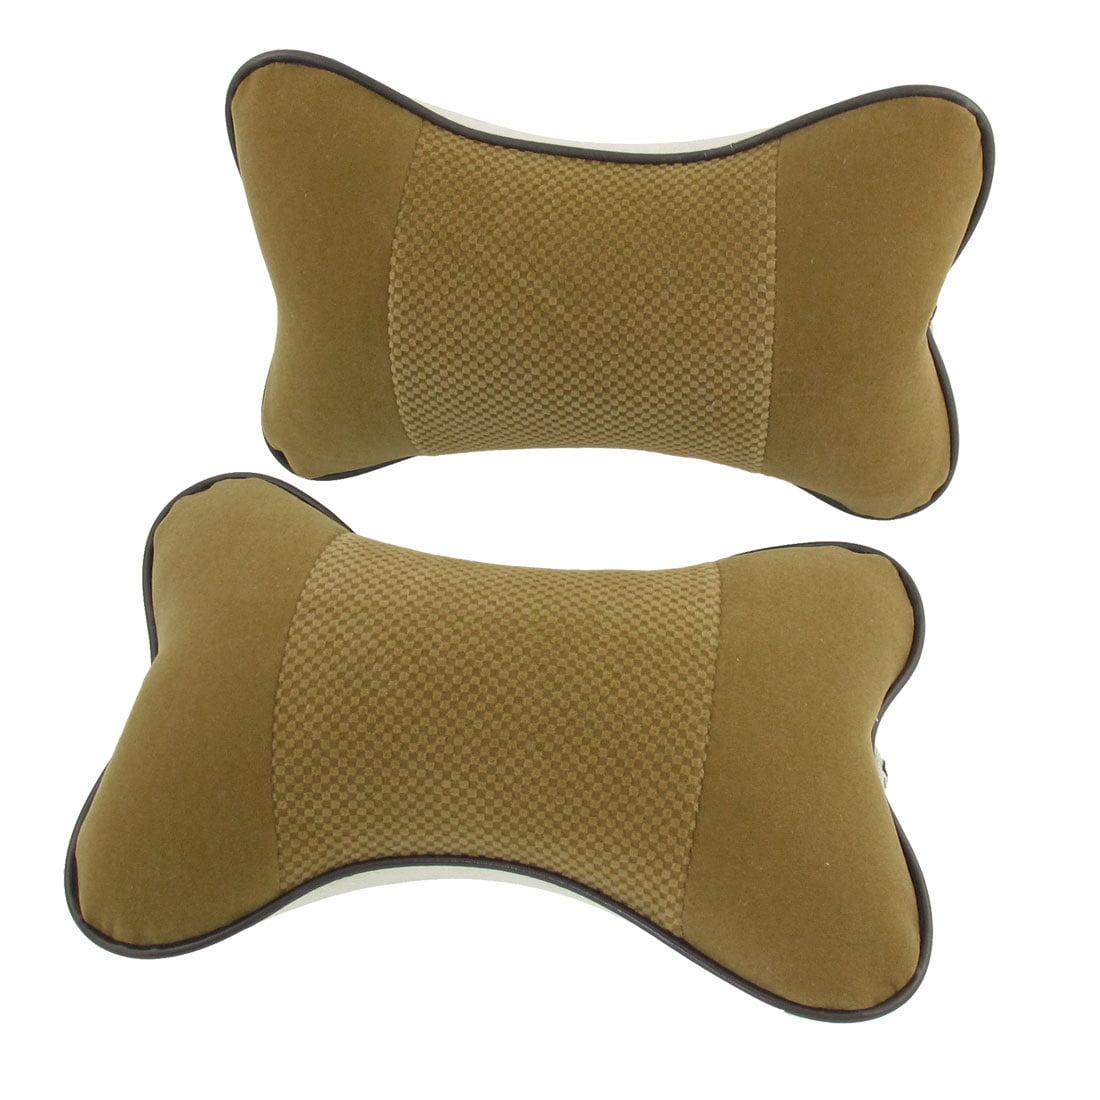 Unique Bargains 2 x Trcuk Zipper Closure Elastic Band Head Rest Pillows Cushion Pad Brown